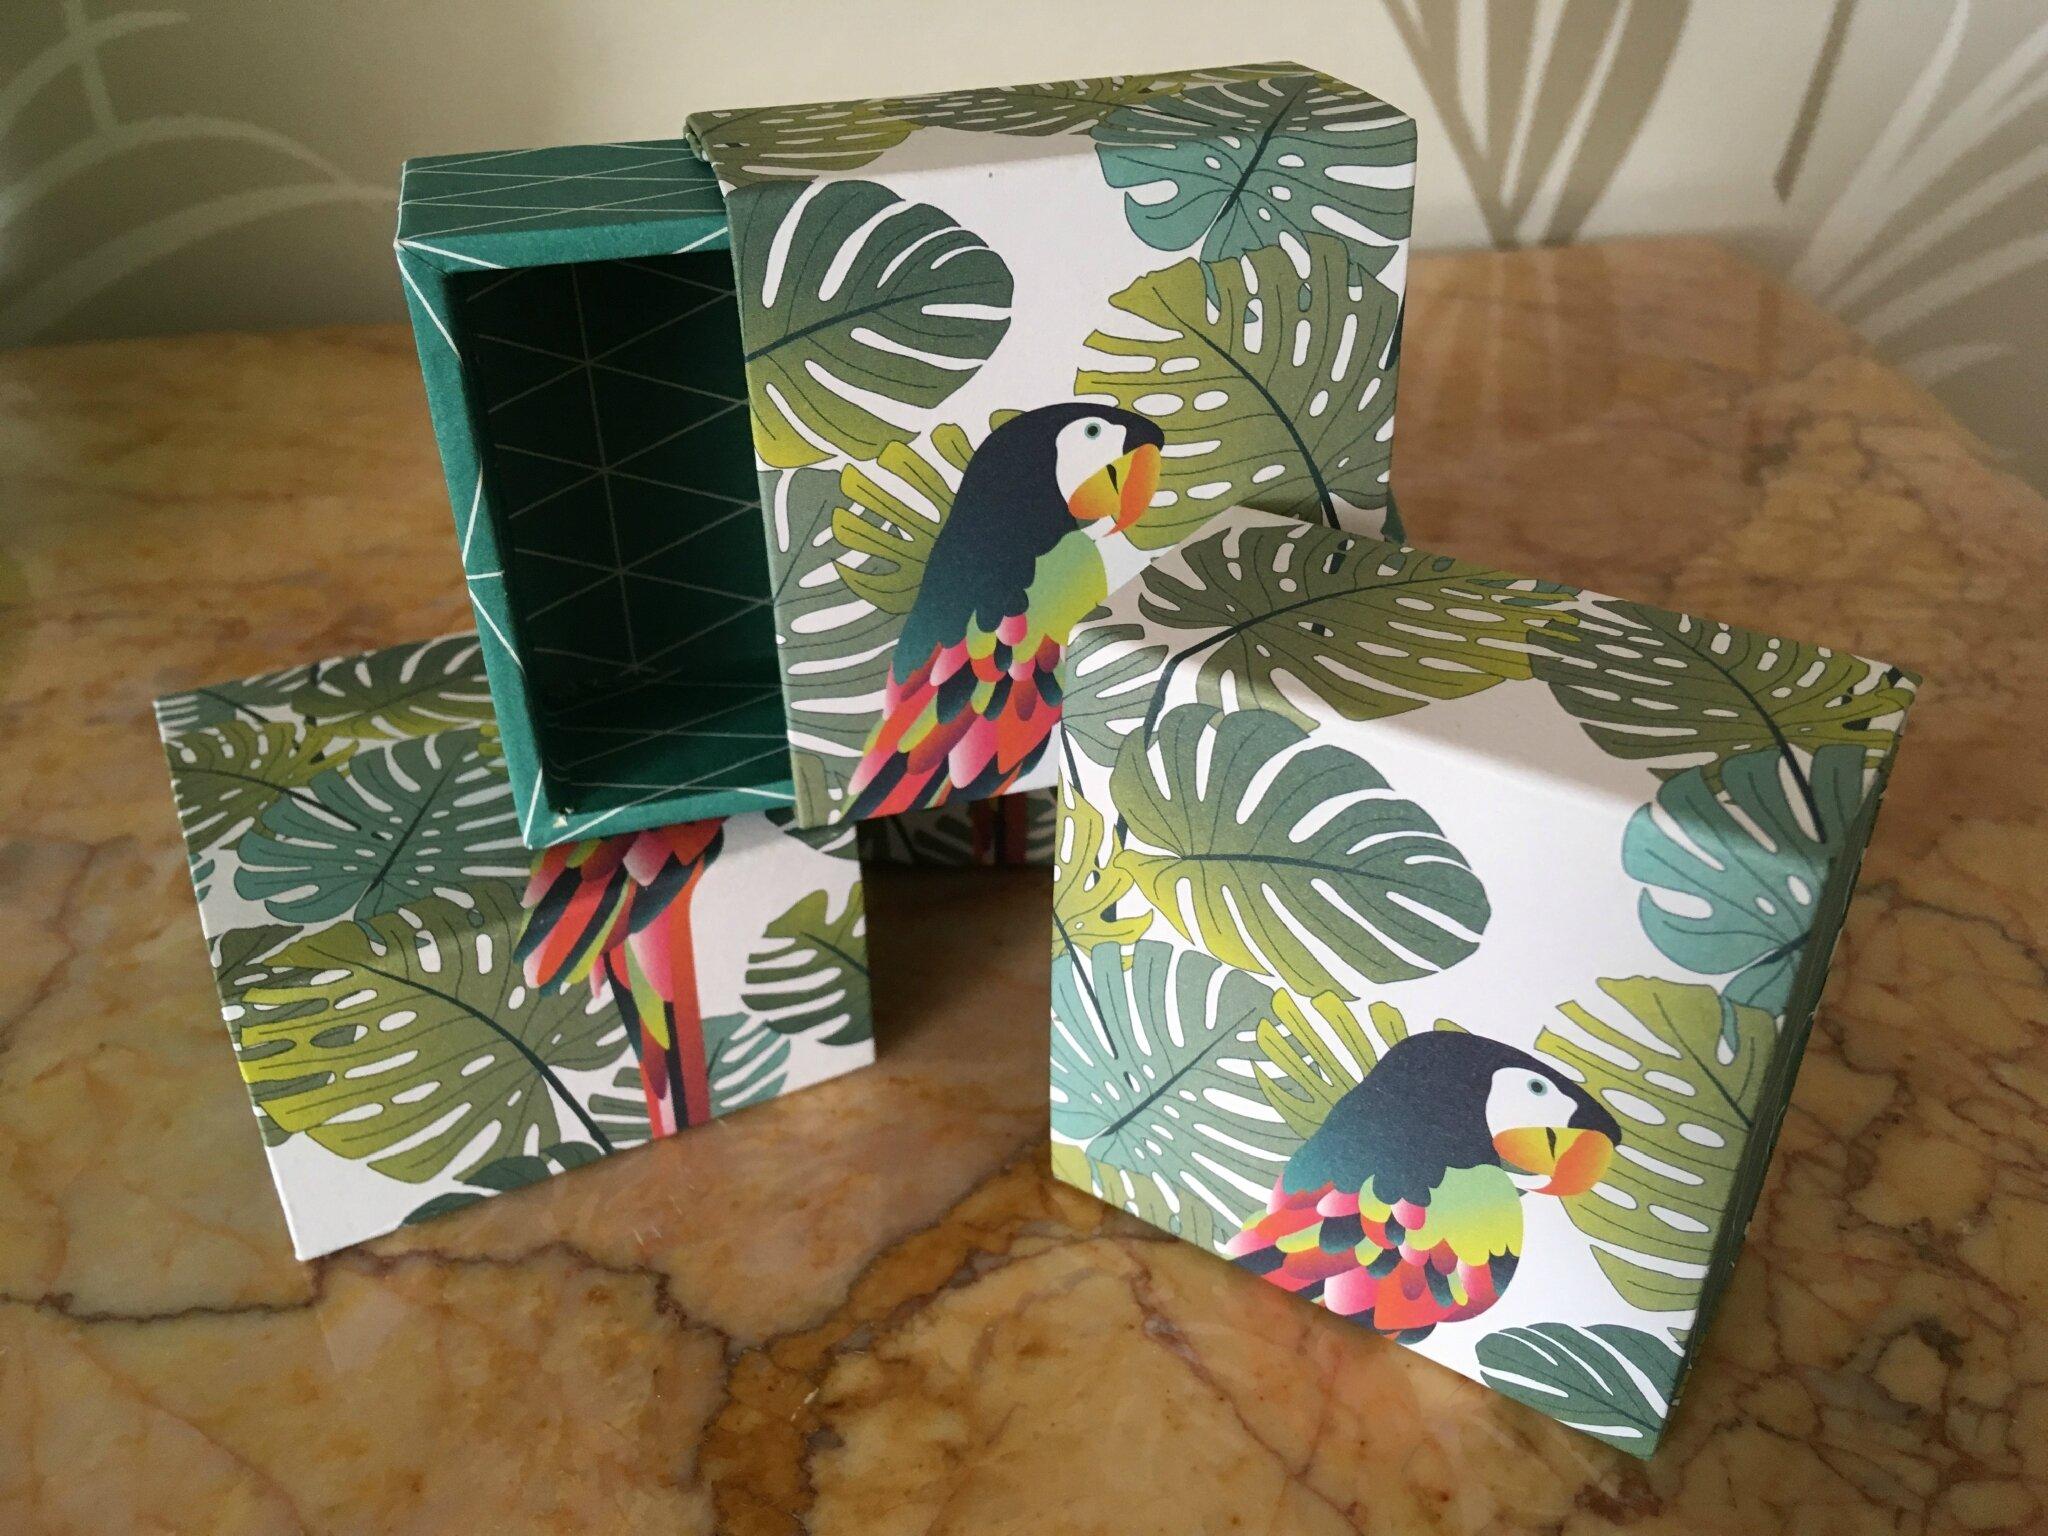 Petites boîtes exotiques